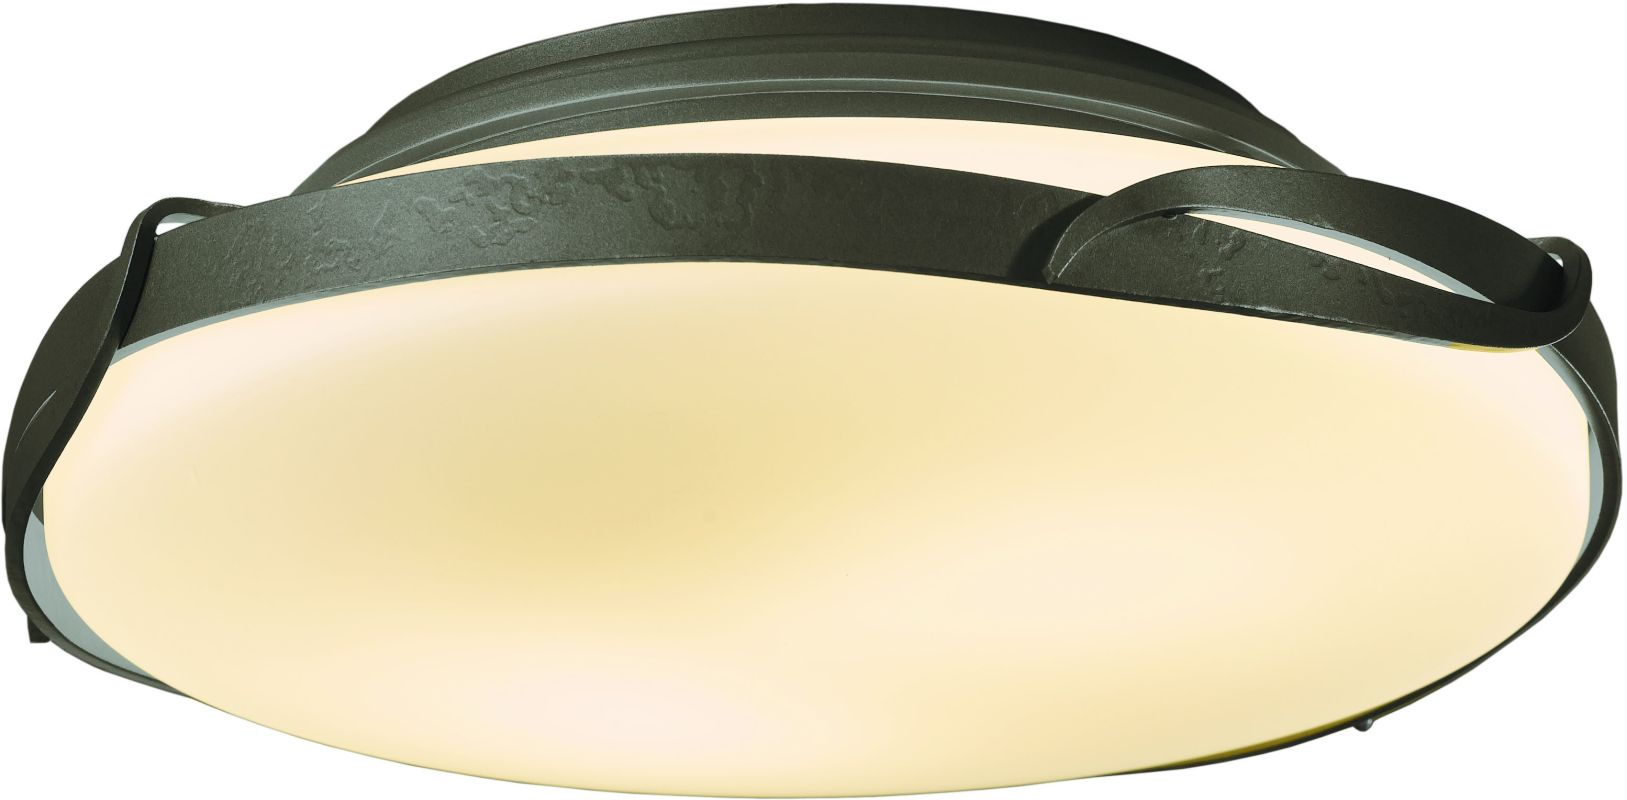 Hubbardton Forge 126740 2 Light Semi-Flush Ceiling Light from the Sale $431.20 ITEM#: 2007251 MODEL# :126740-07 :